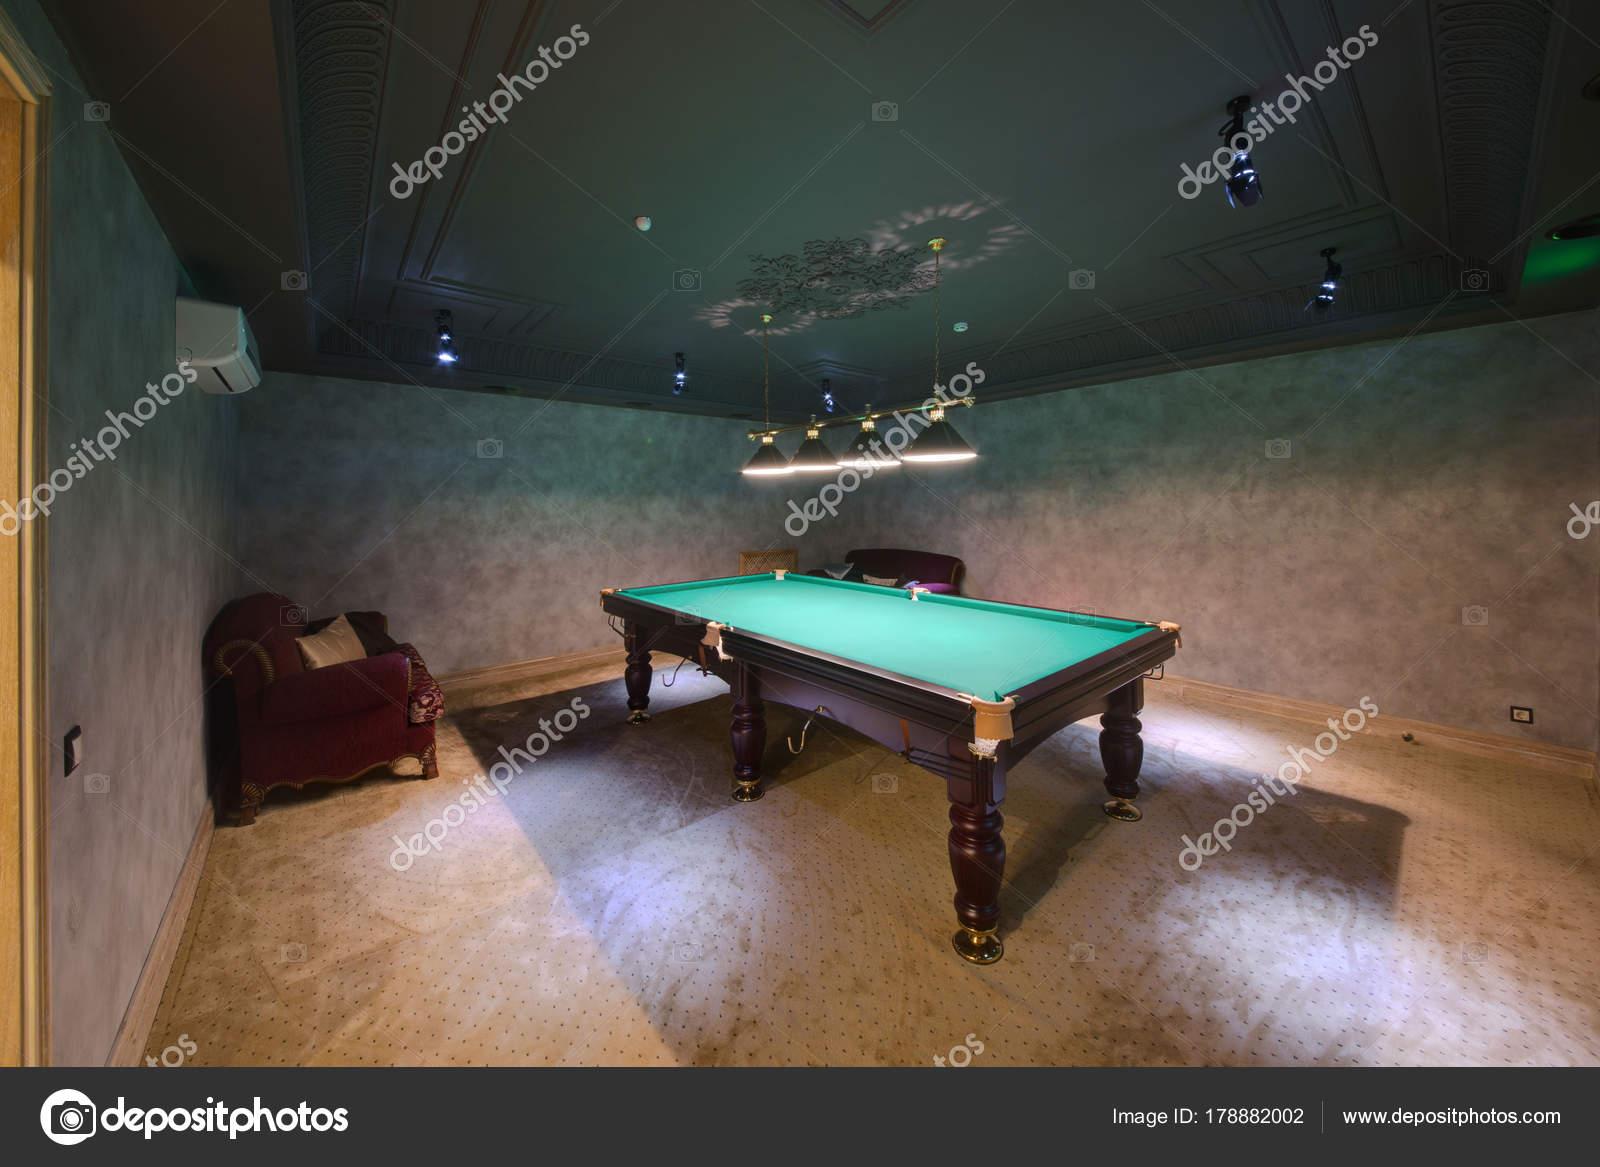 Billiard Table Lamps Illumination Small Room Stock Photo C Twins03